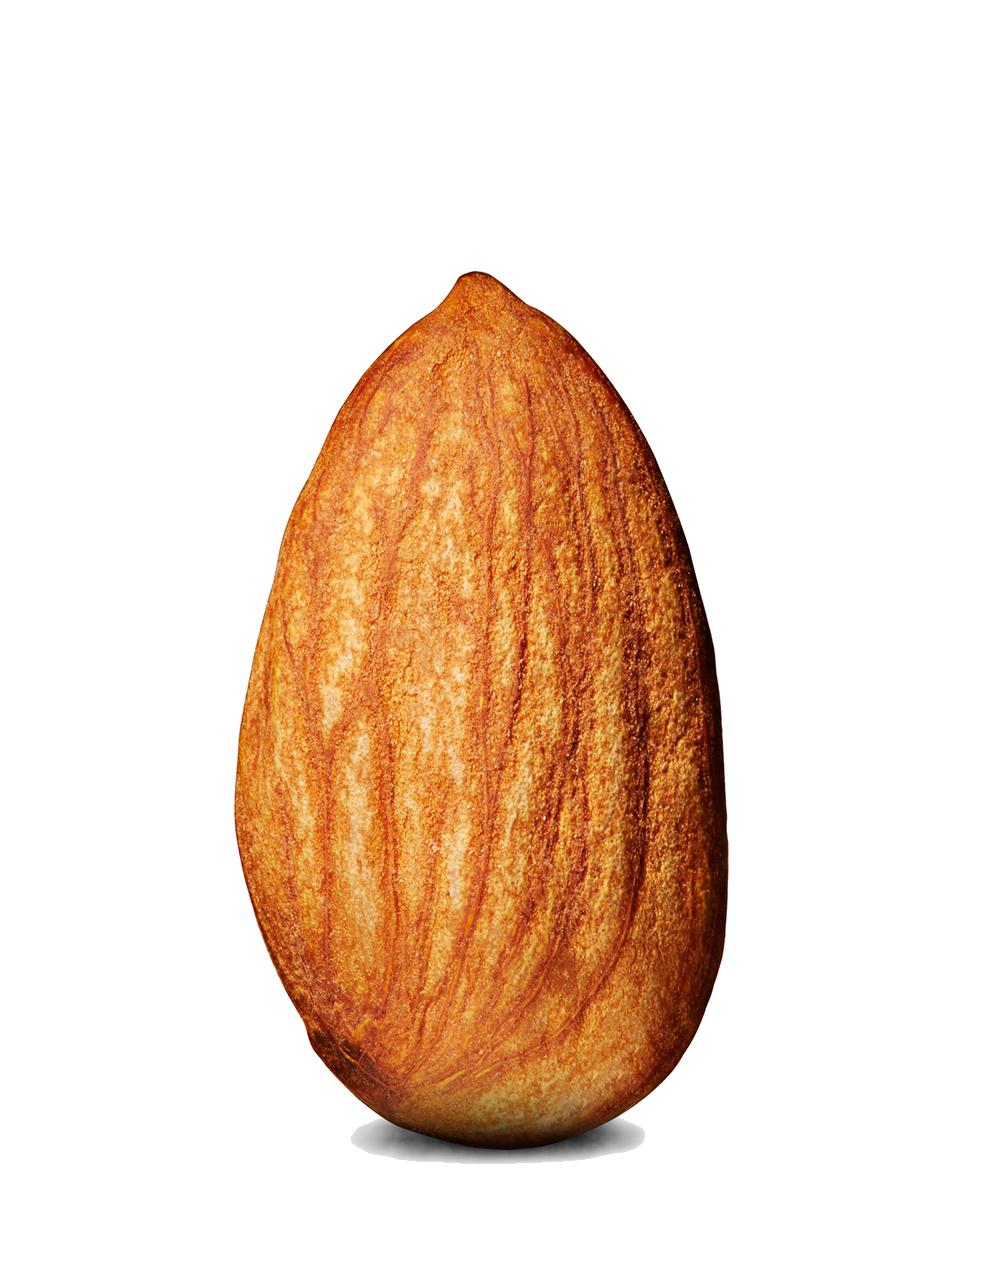 Almond Backgrounds, Compatible - PC, Mobile, Gadgets  1000x1266 px